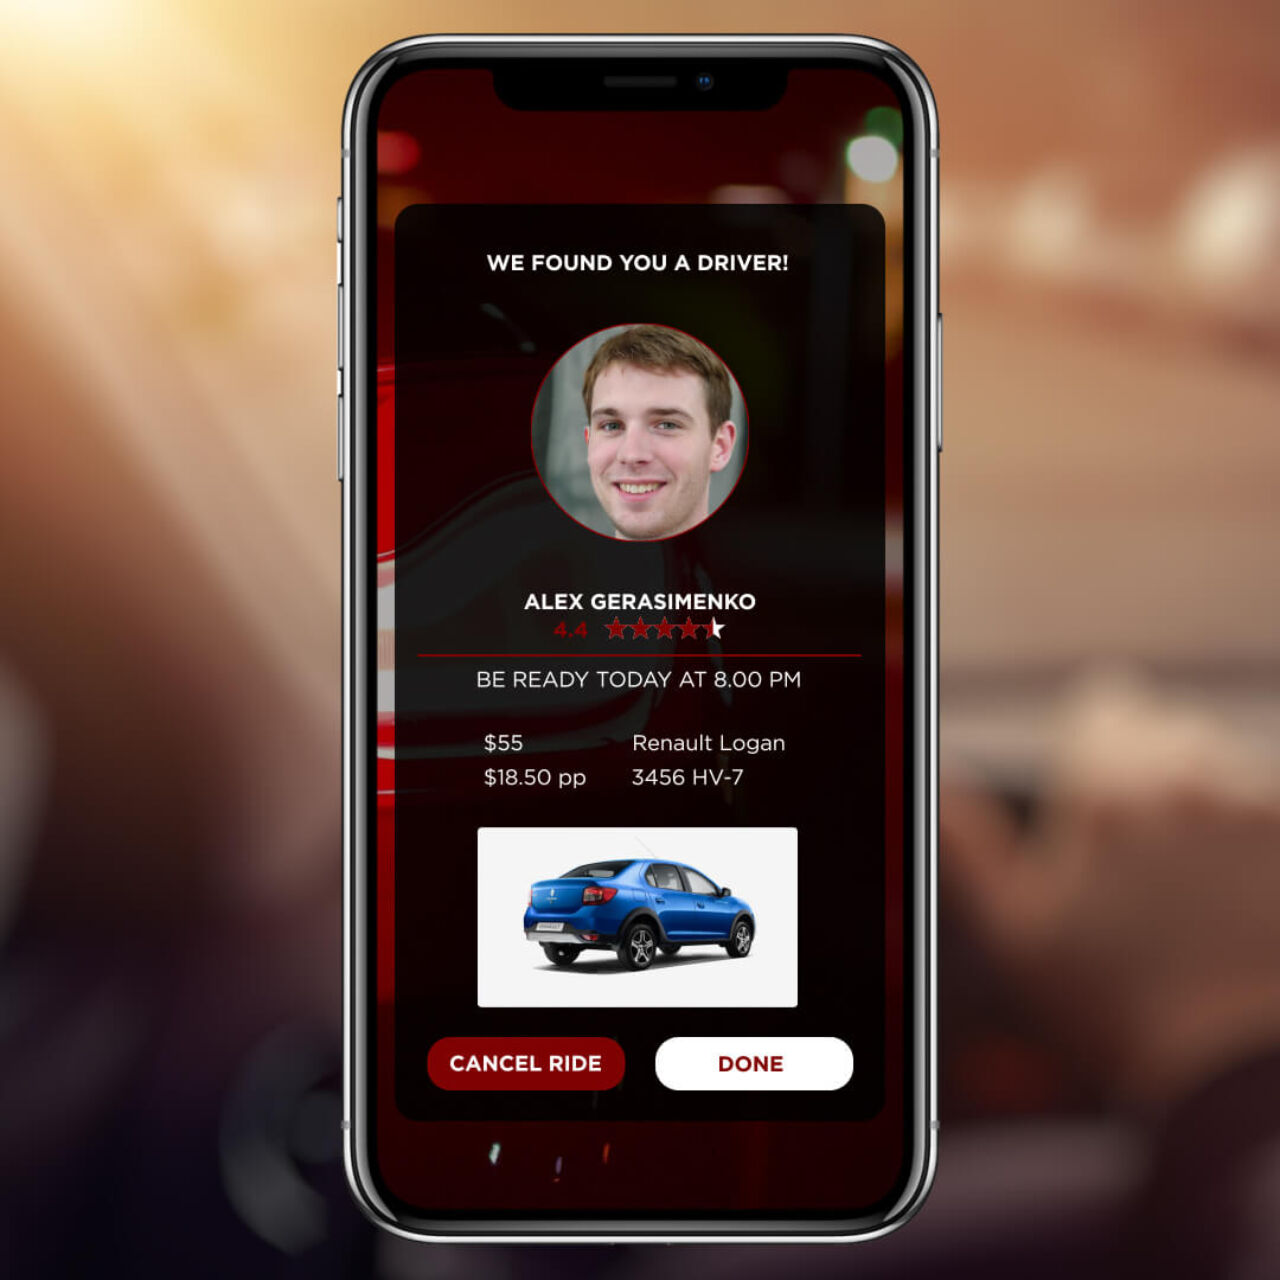 Ride App - Found a driver